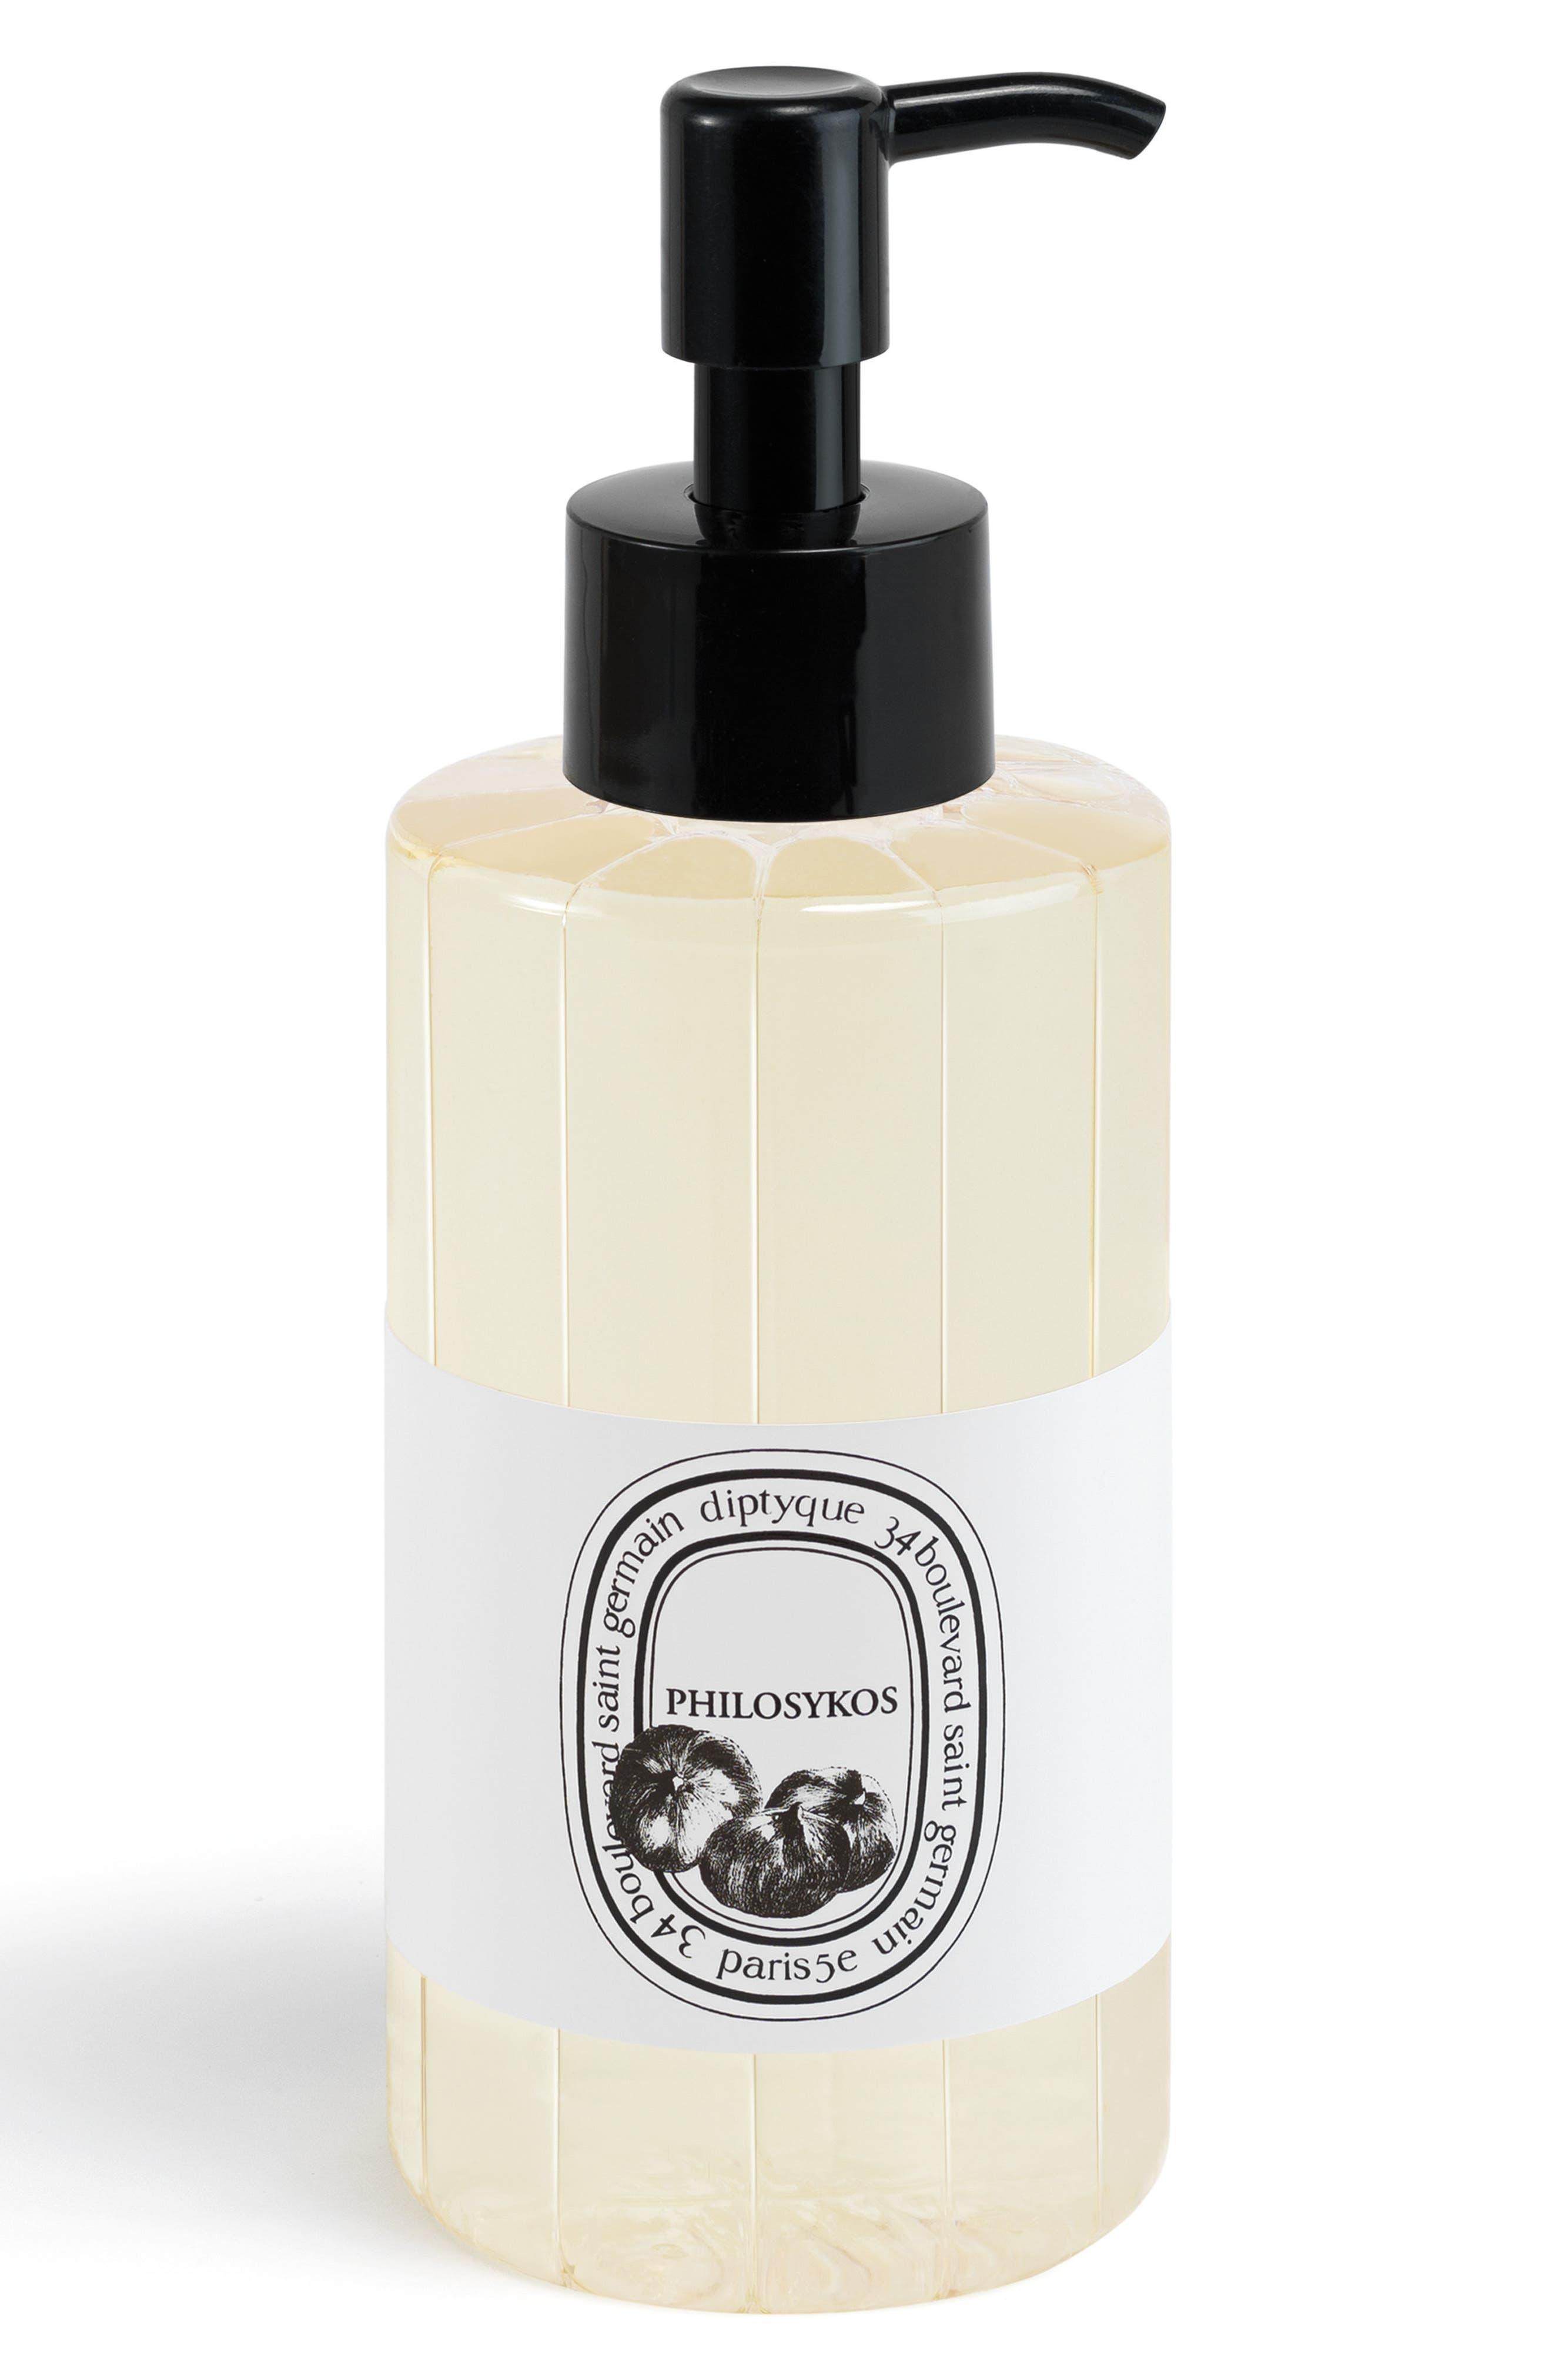 diptyque Philosykos Cleansing Hand & Body Gel